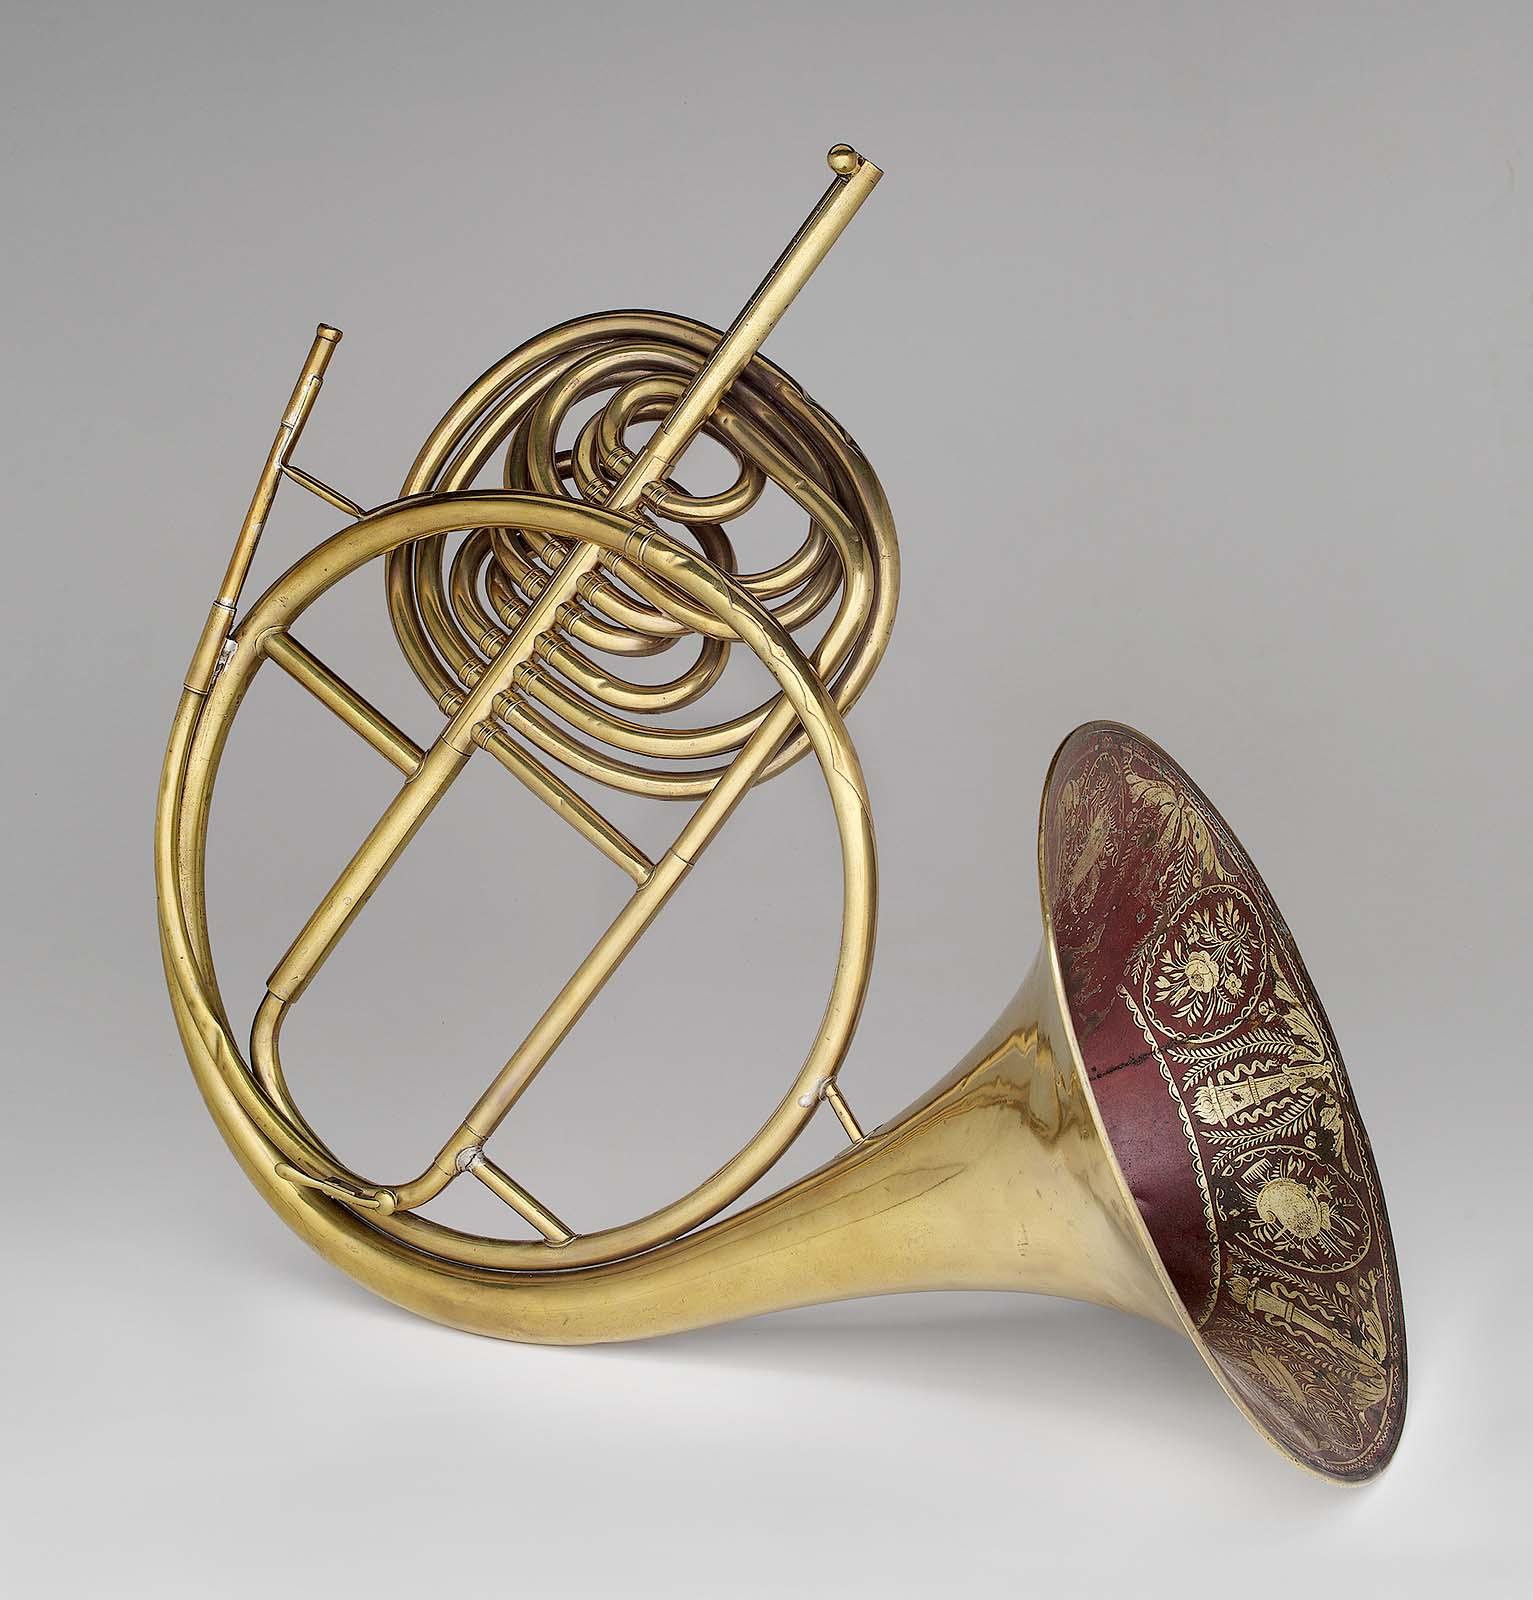 omnitonic horn museum of fine arts boston